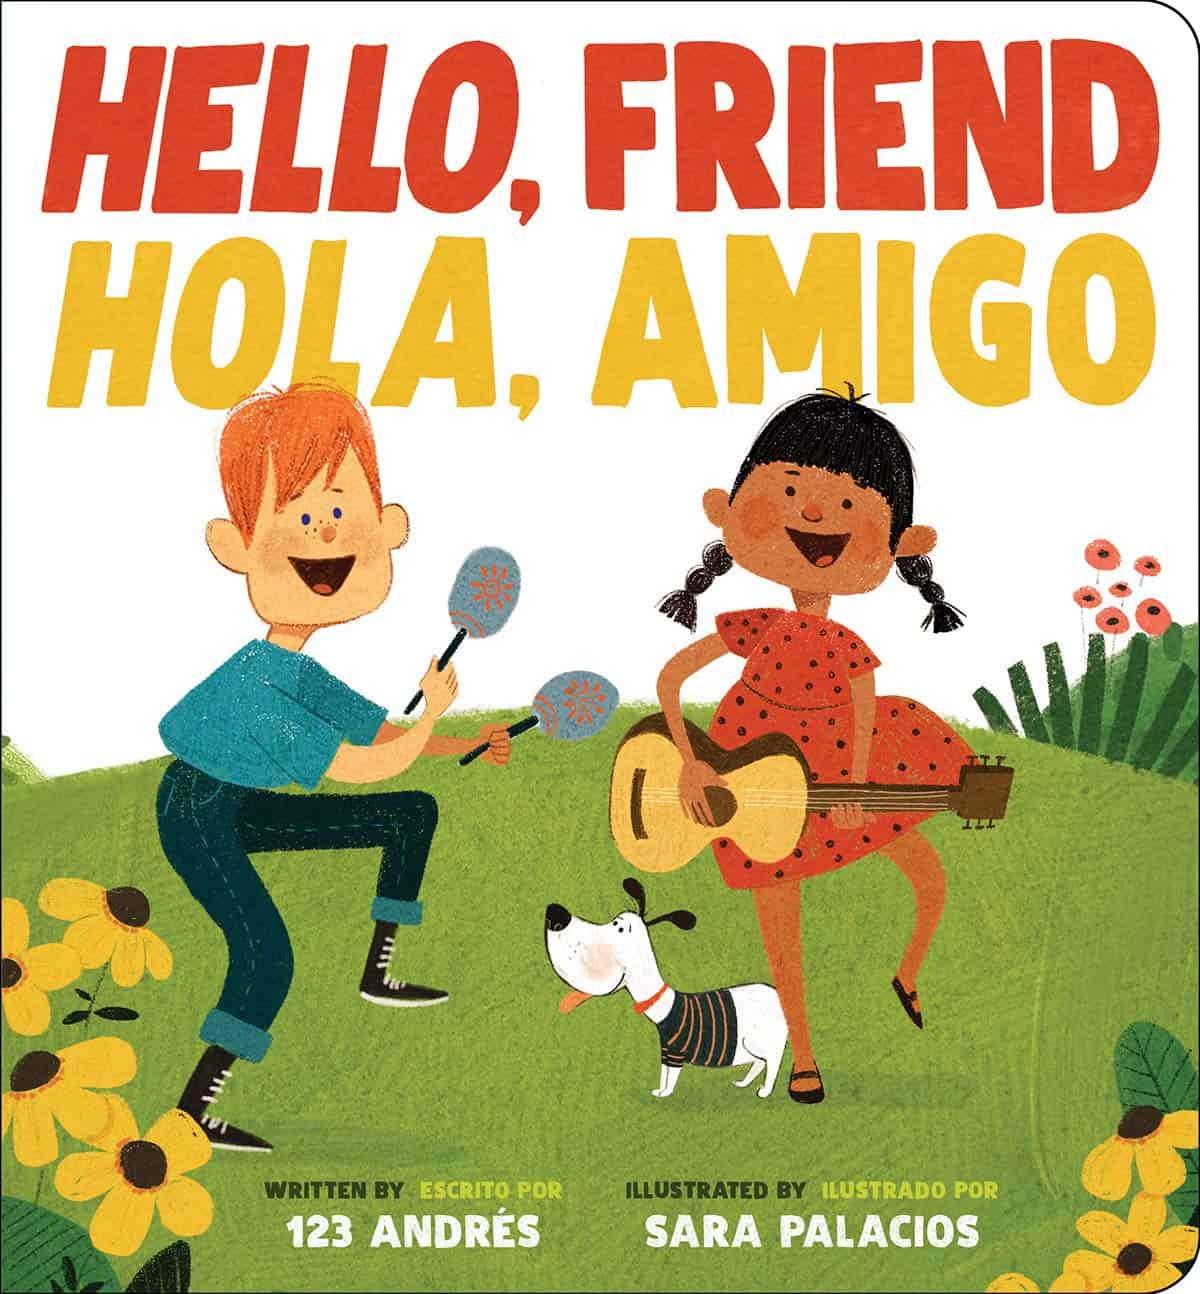 Hello, Friend, Hola, Amigo!